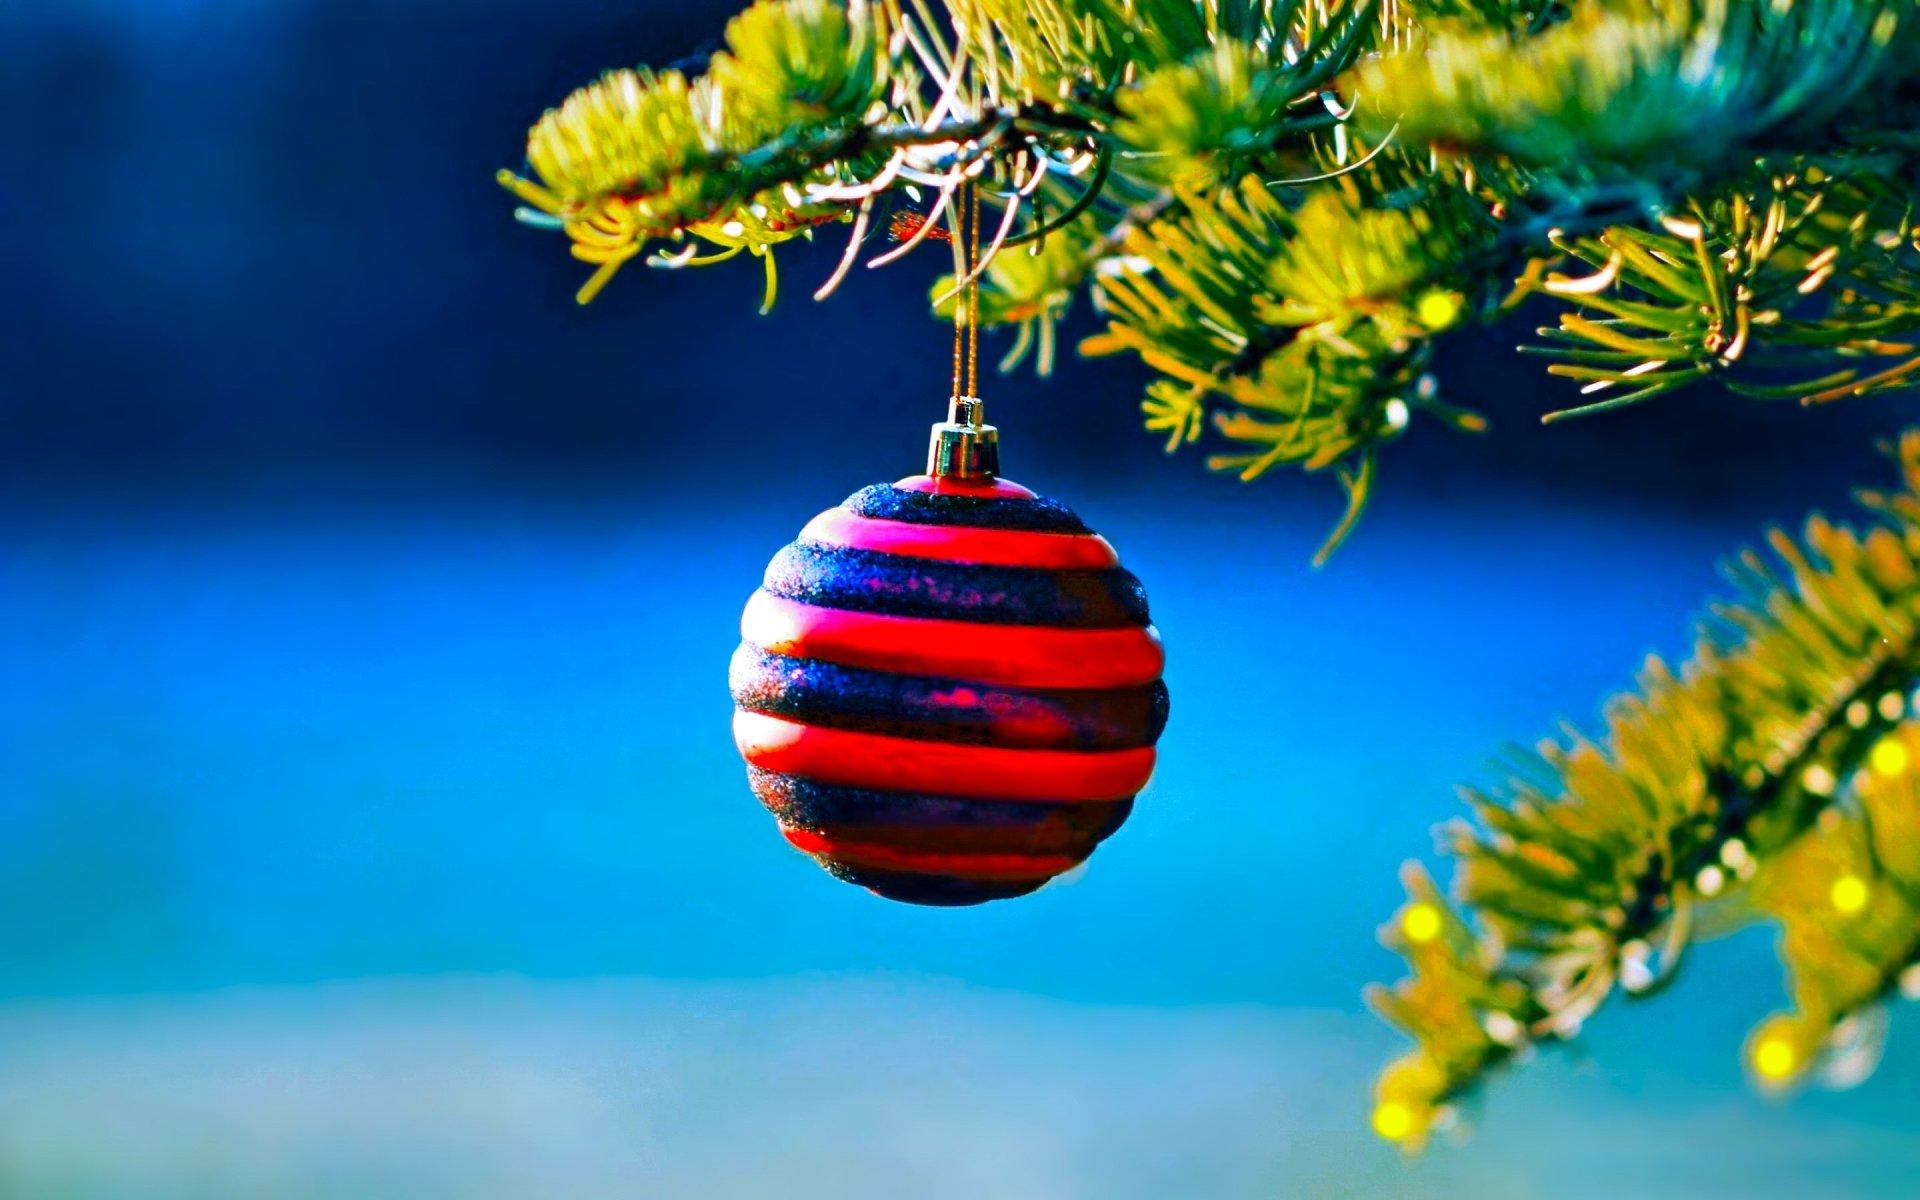 Holiday - Christmas  Christmas Ornaments Holiday Wallpaper